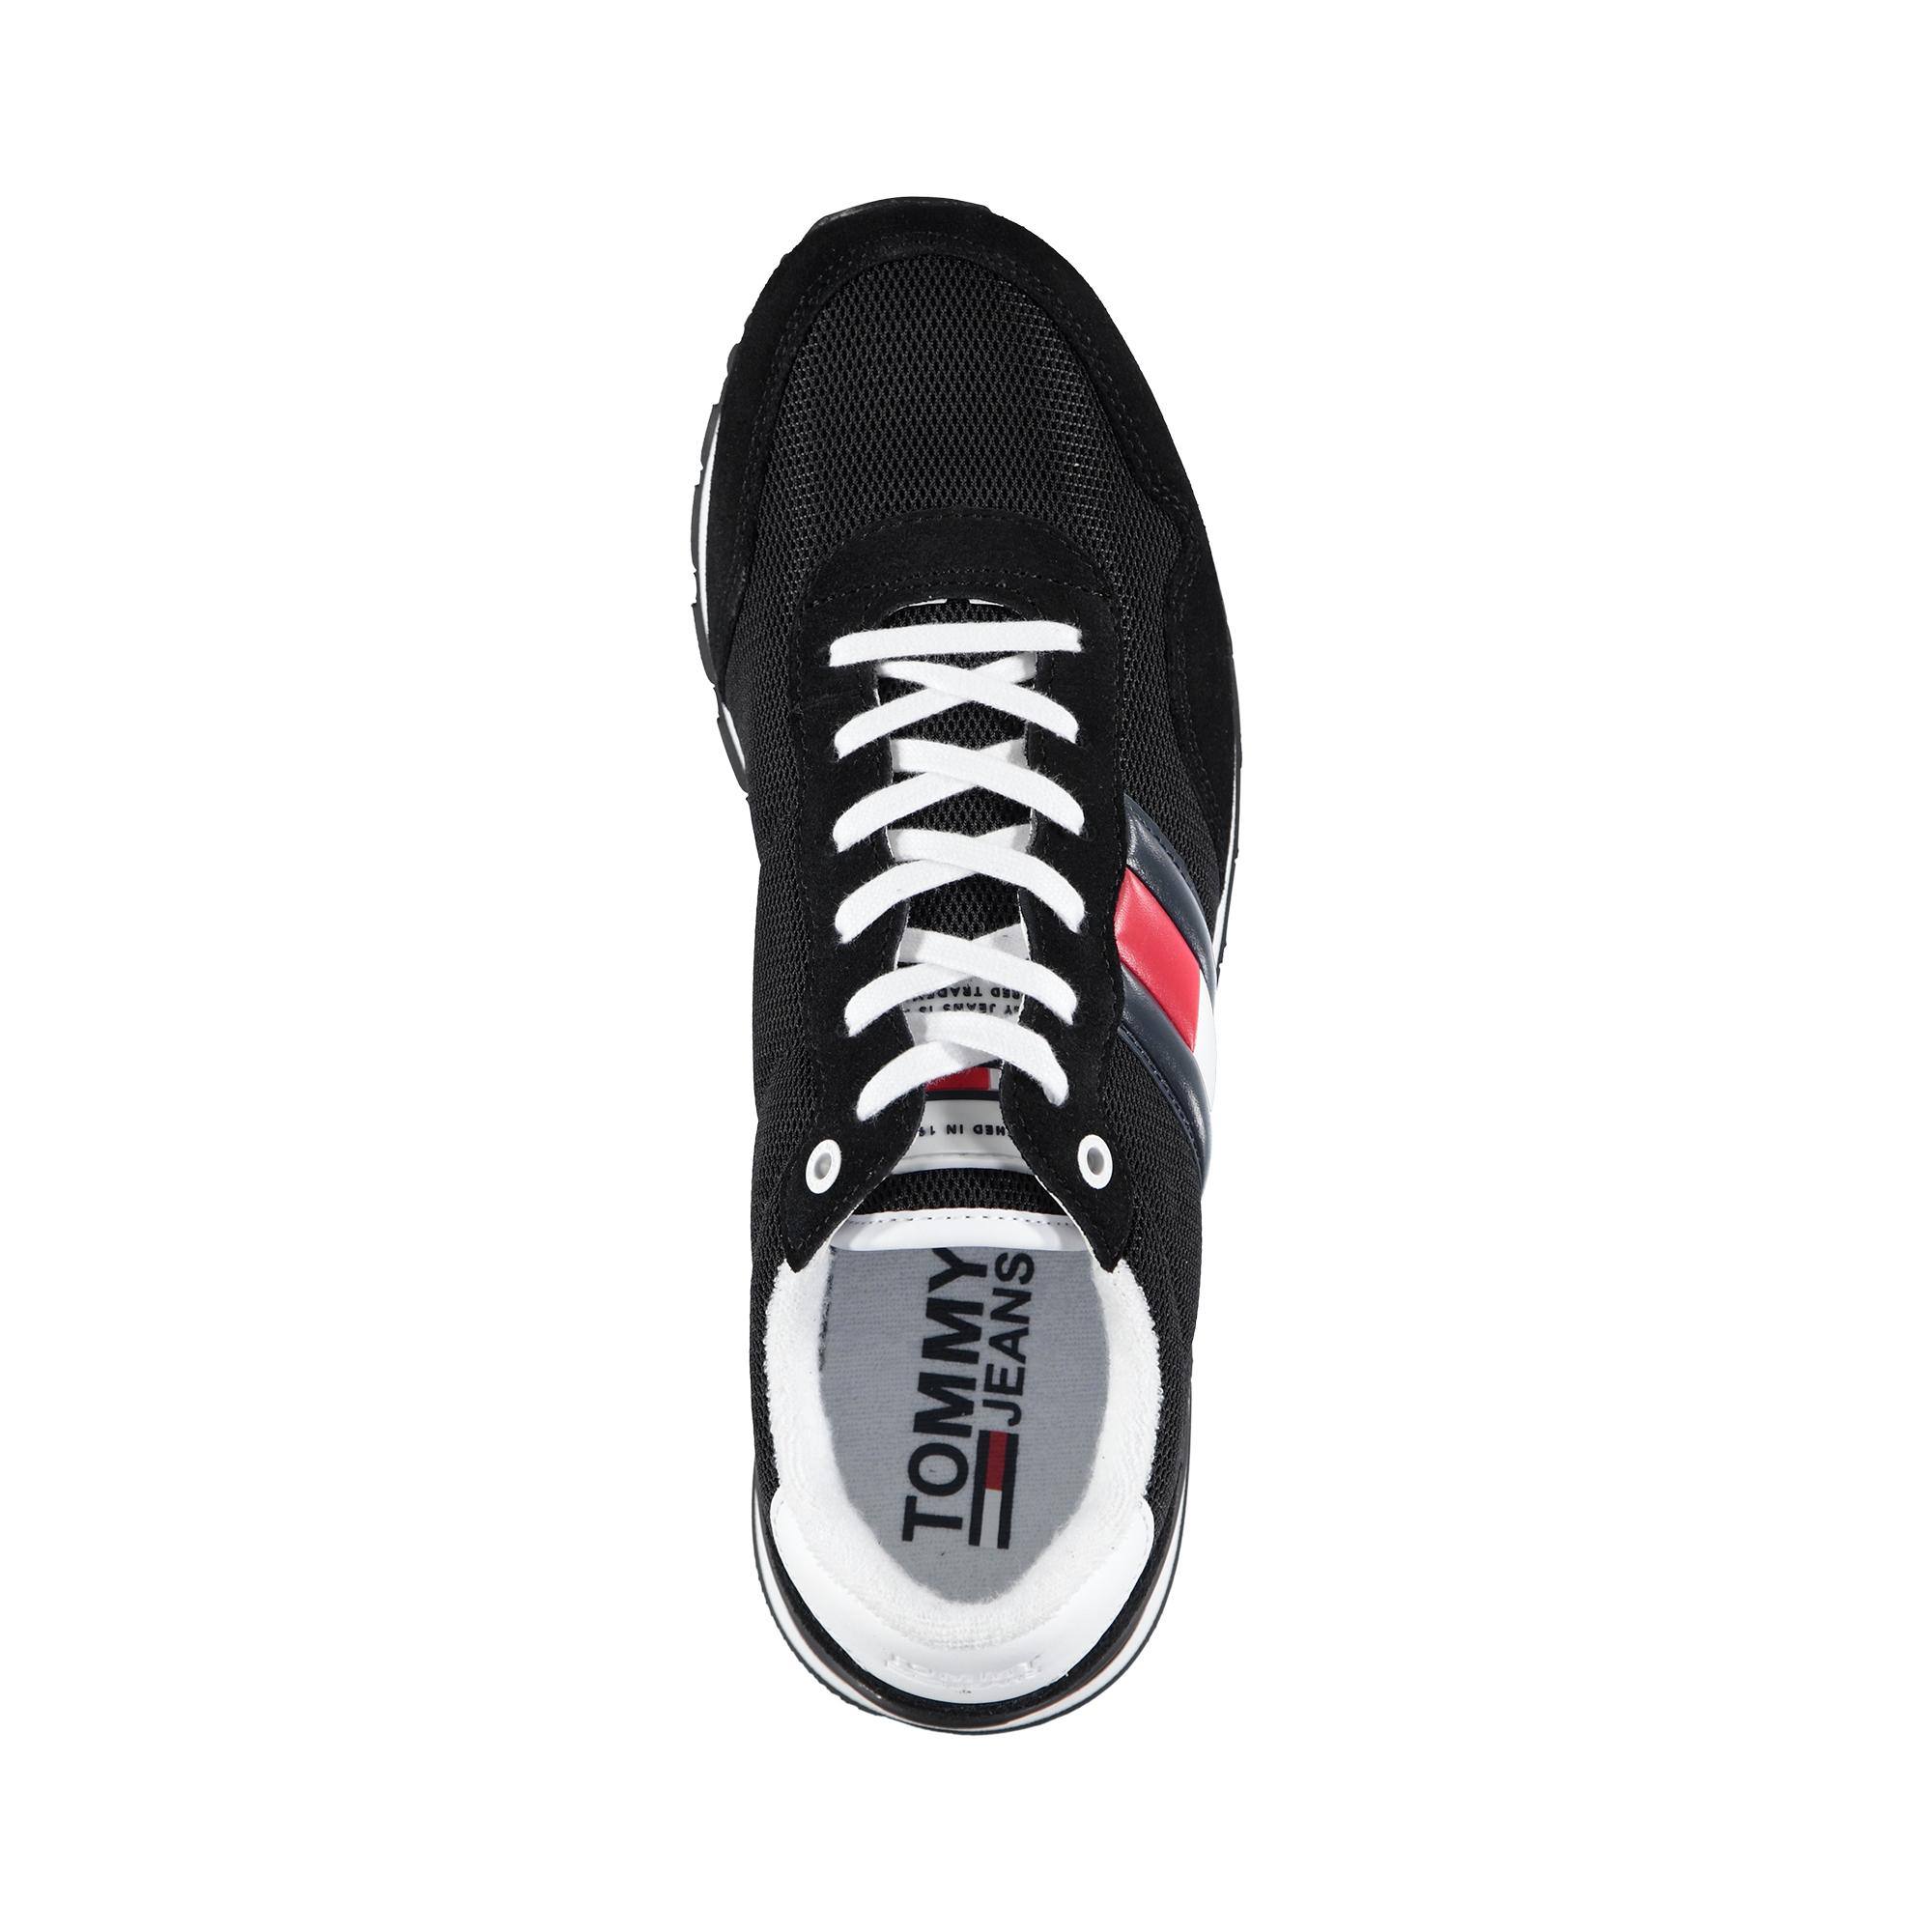 Tommy Hilfiger Casual Jeans's Erkek Siyah Spor Ayakkabı